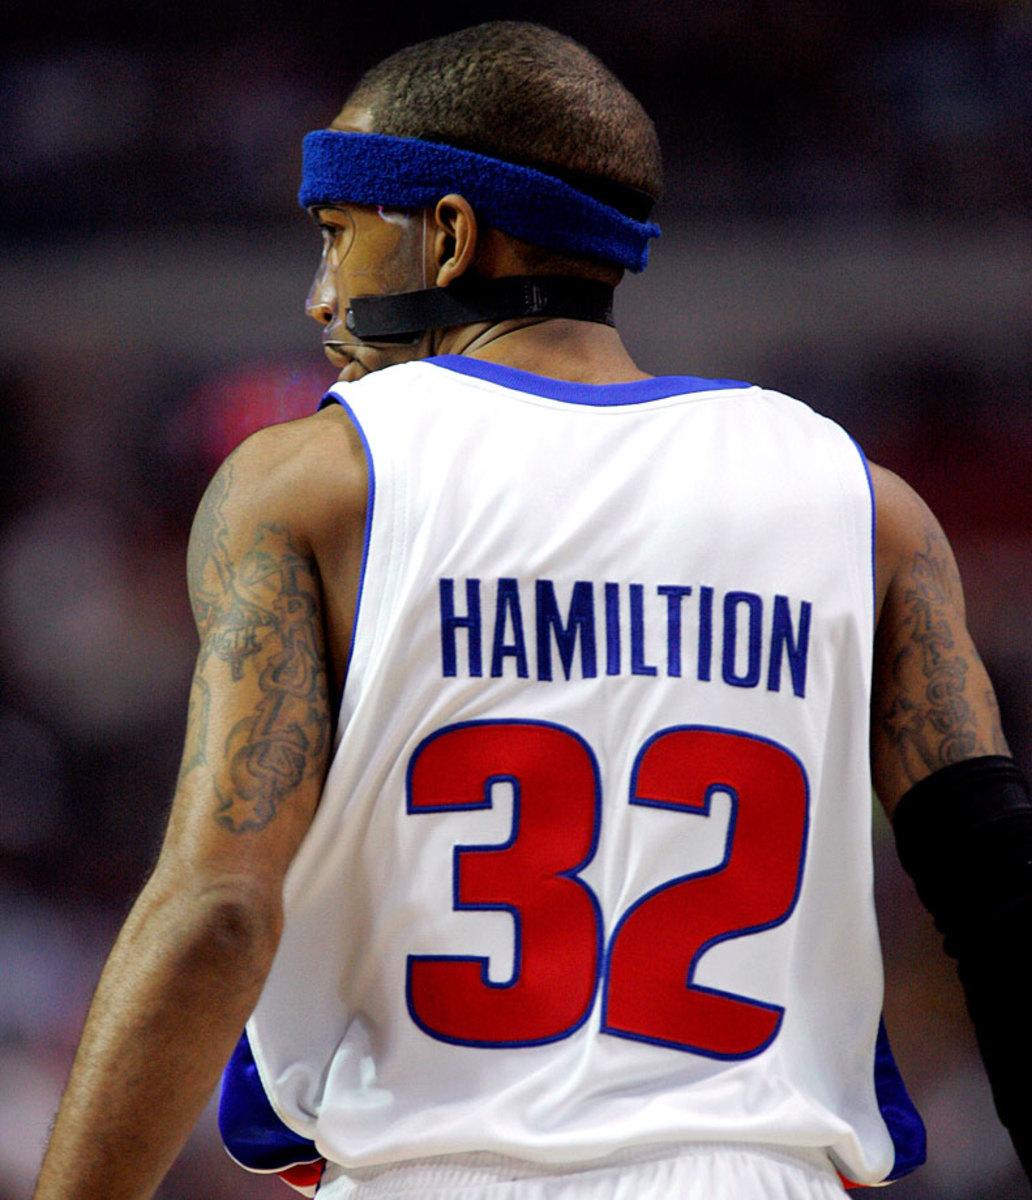 Richard-Hamilton-HAMILTION-jersey.jpg